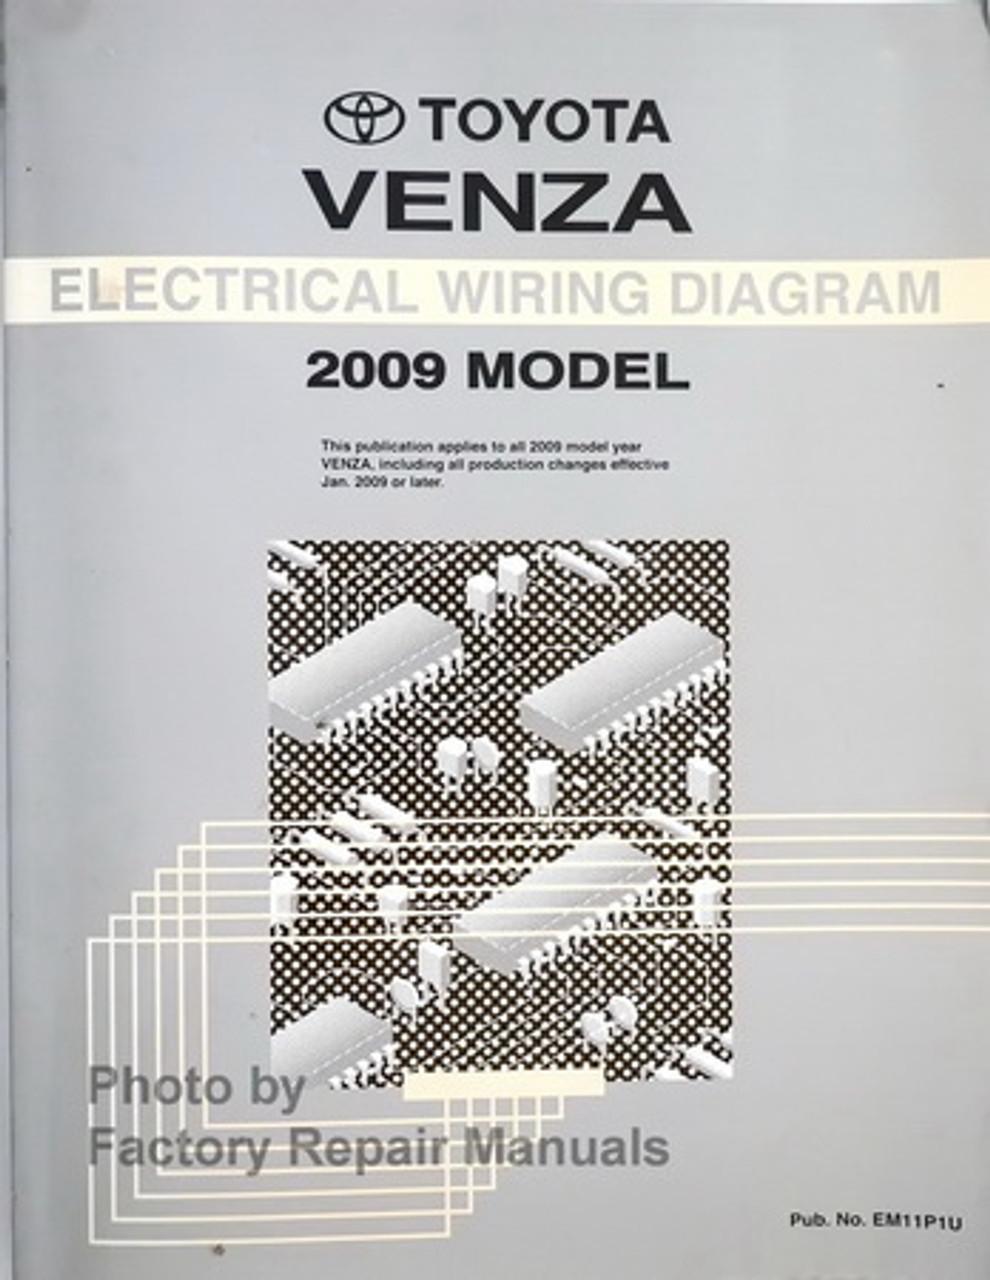 Diagram 2009 Toyota Venza Wiring Diagram Manual Original Full Version Hd Quality Manual Original Smcwiringl Wecsrl It